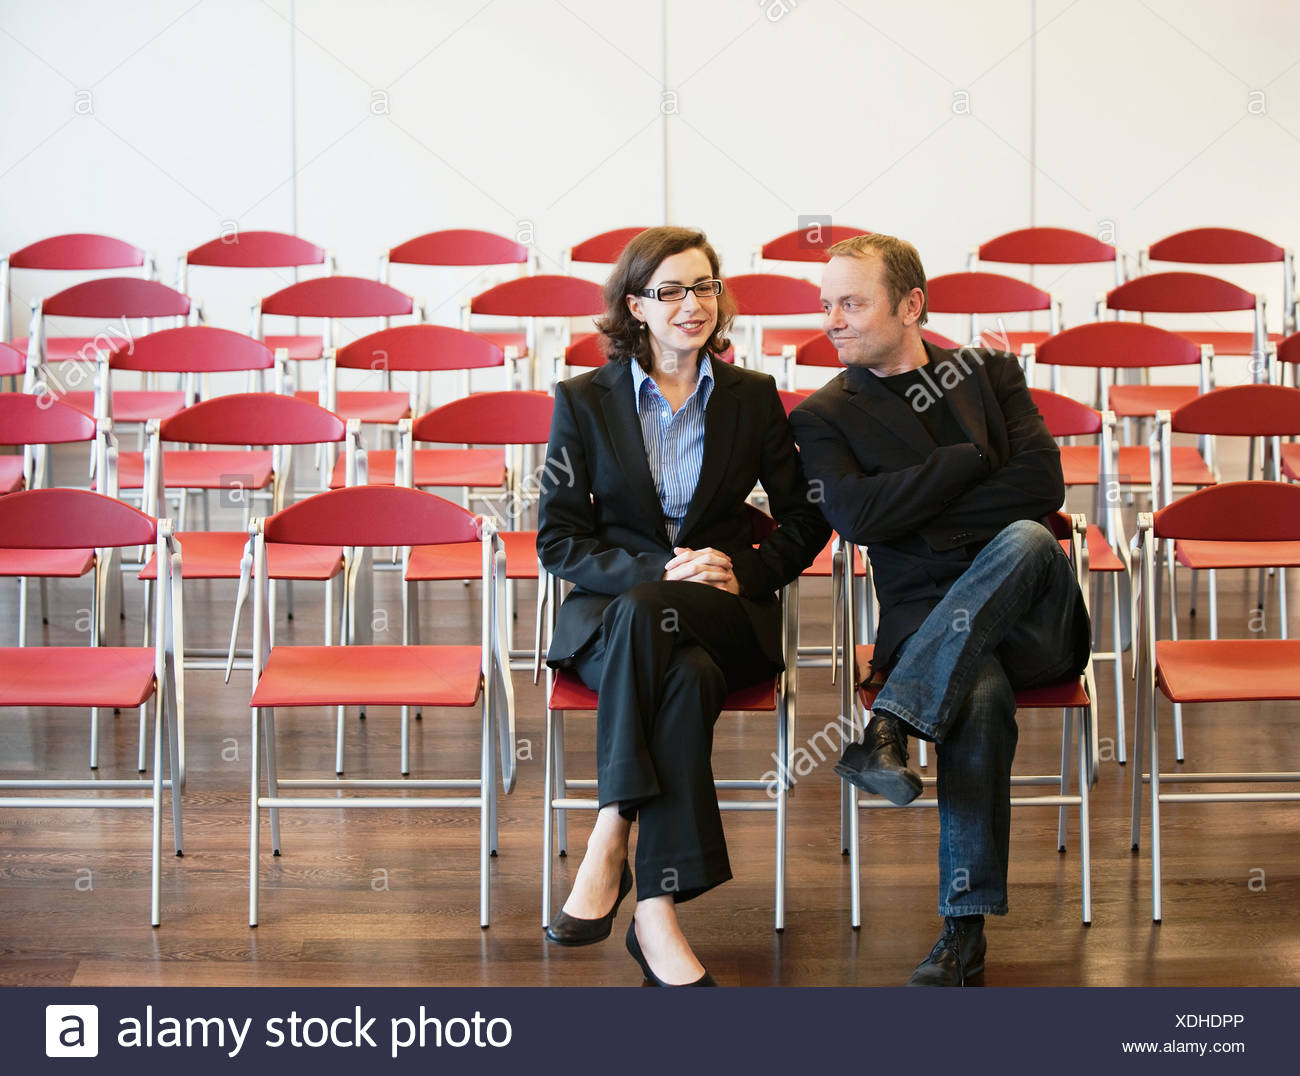 businessman, woman among empty chairs - Stock Image